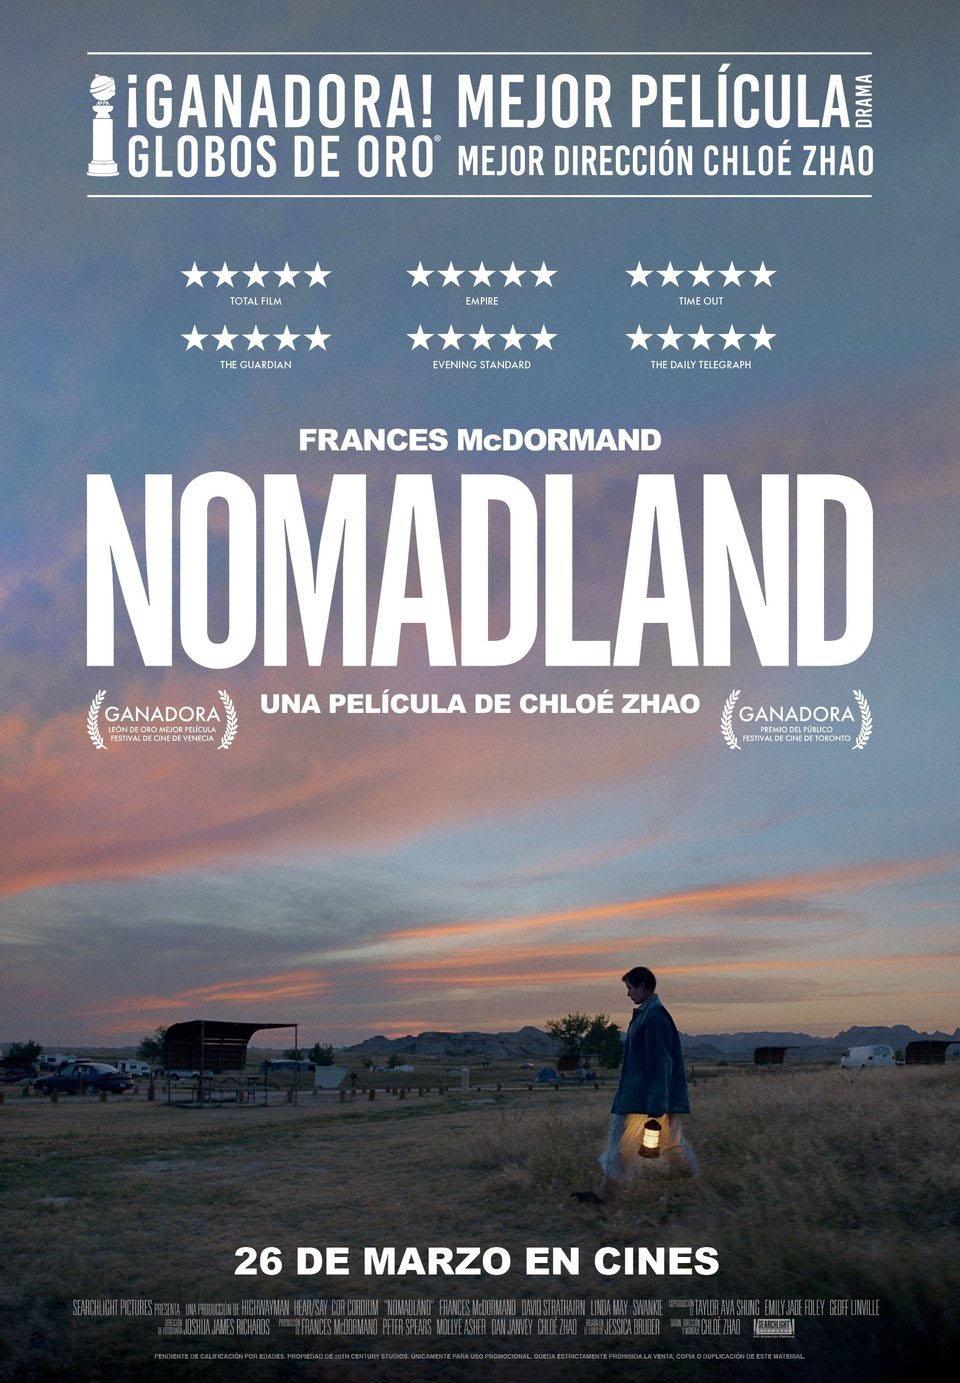 Cinema: NOMADLAND / 19-06-2021, a les 18 h, al Teatre Auditori de l'Hospitalet de l'Infant